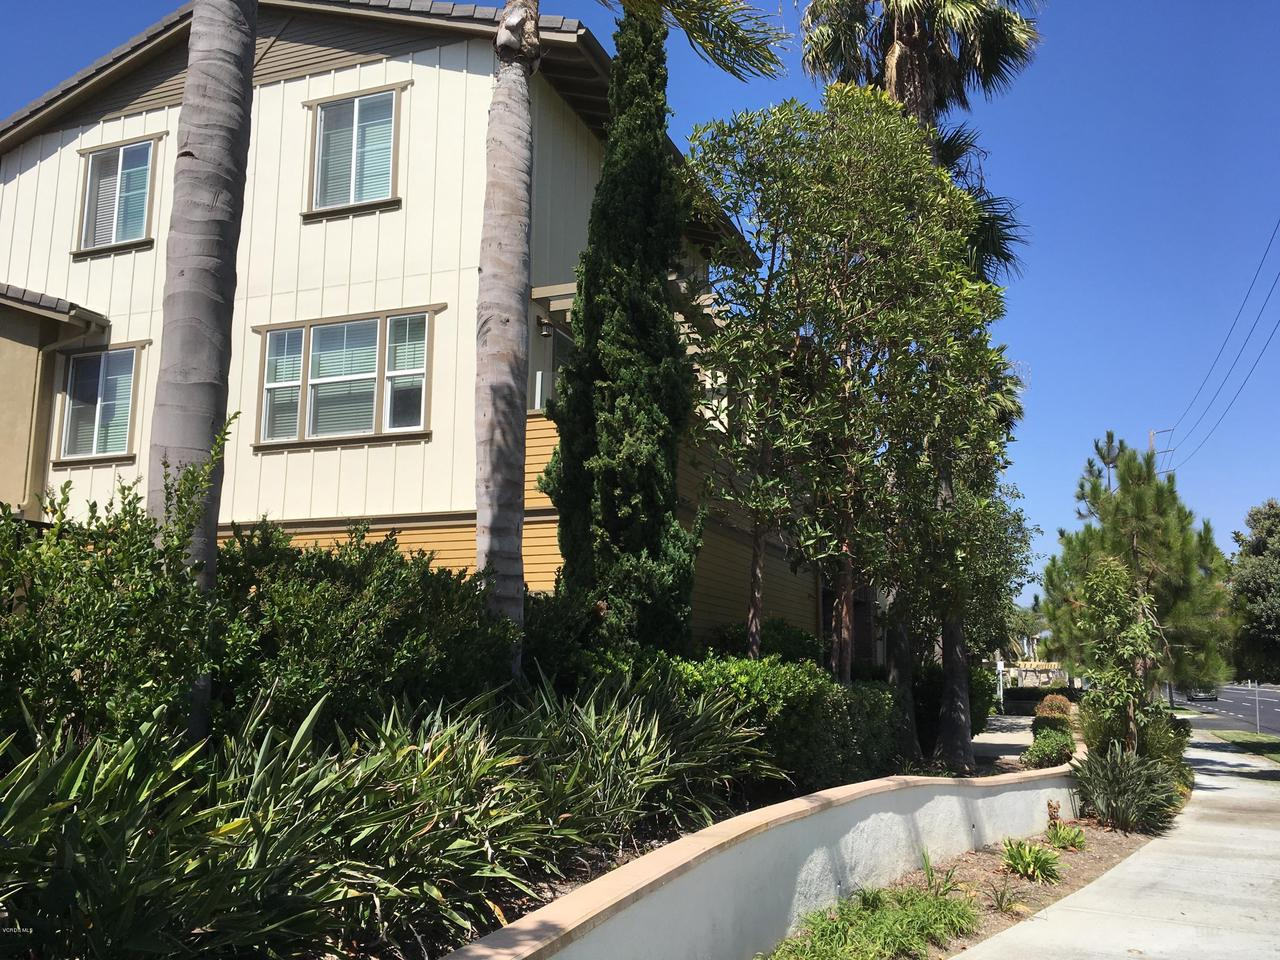 1406 WINDSHORE, Oxnard, CA 93035 - Exterior View